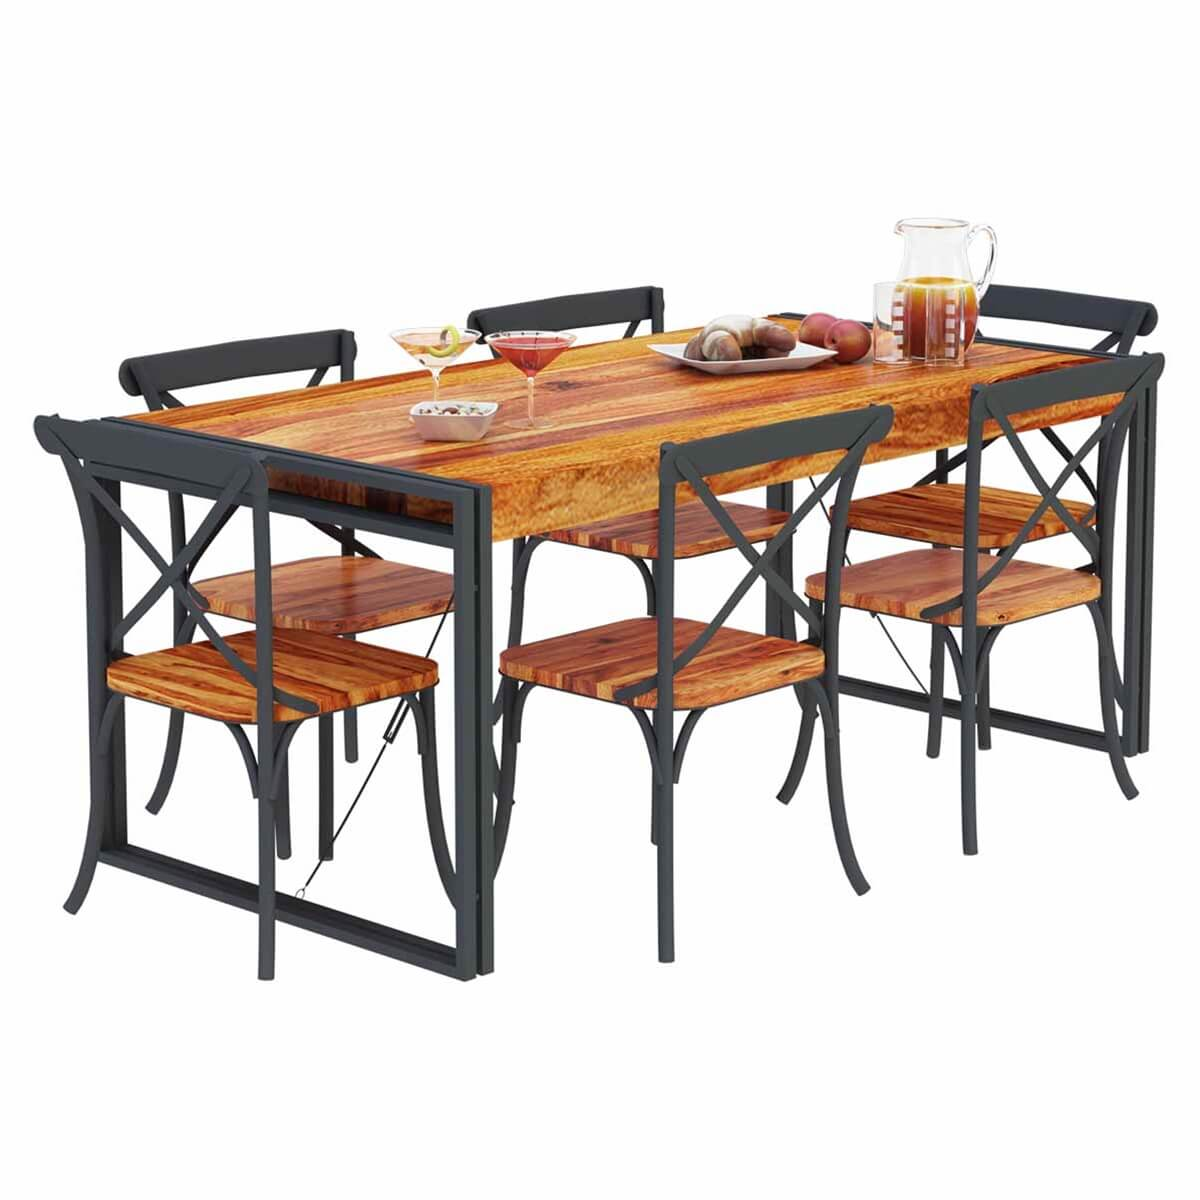 Handmade Solid Wood Island Units: Texas Industrial Handmade Rustic Solid Wood Dining Table